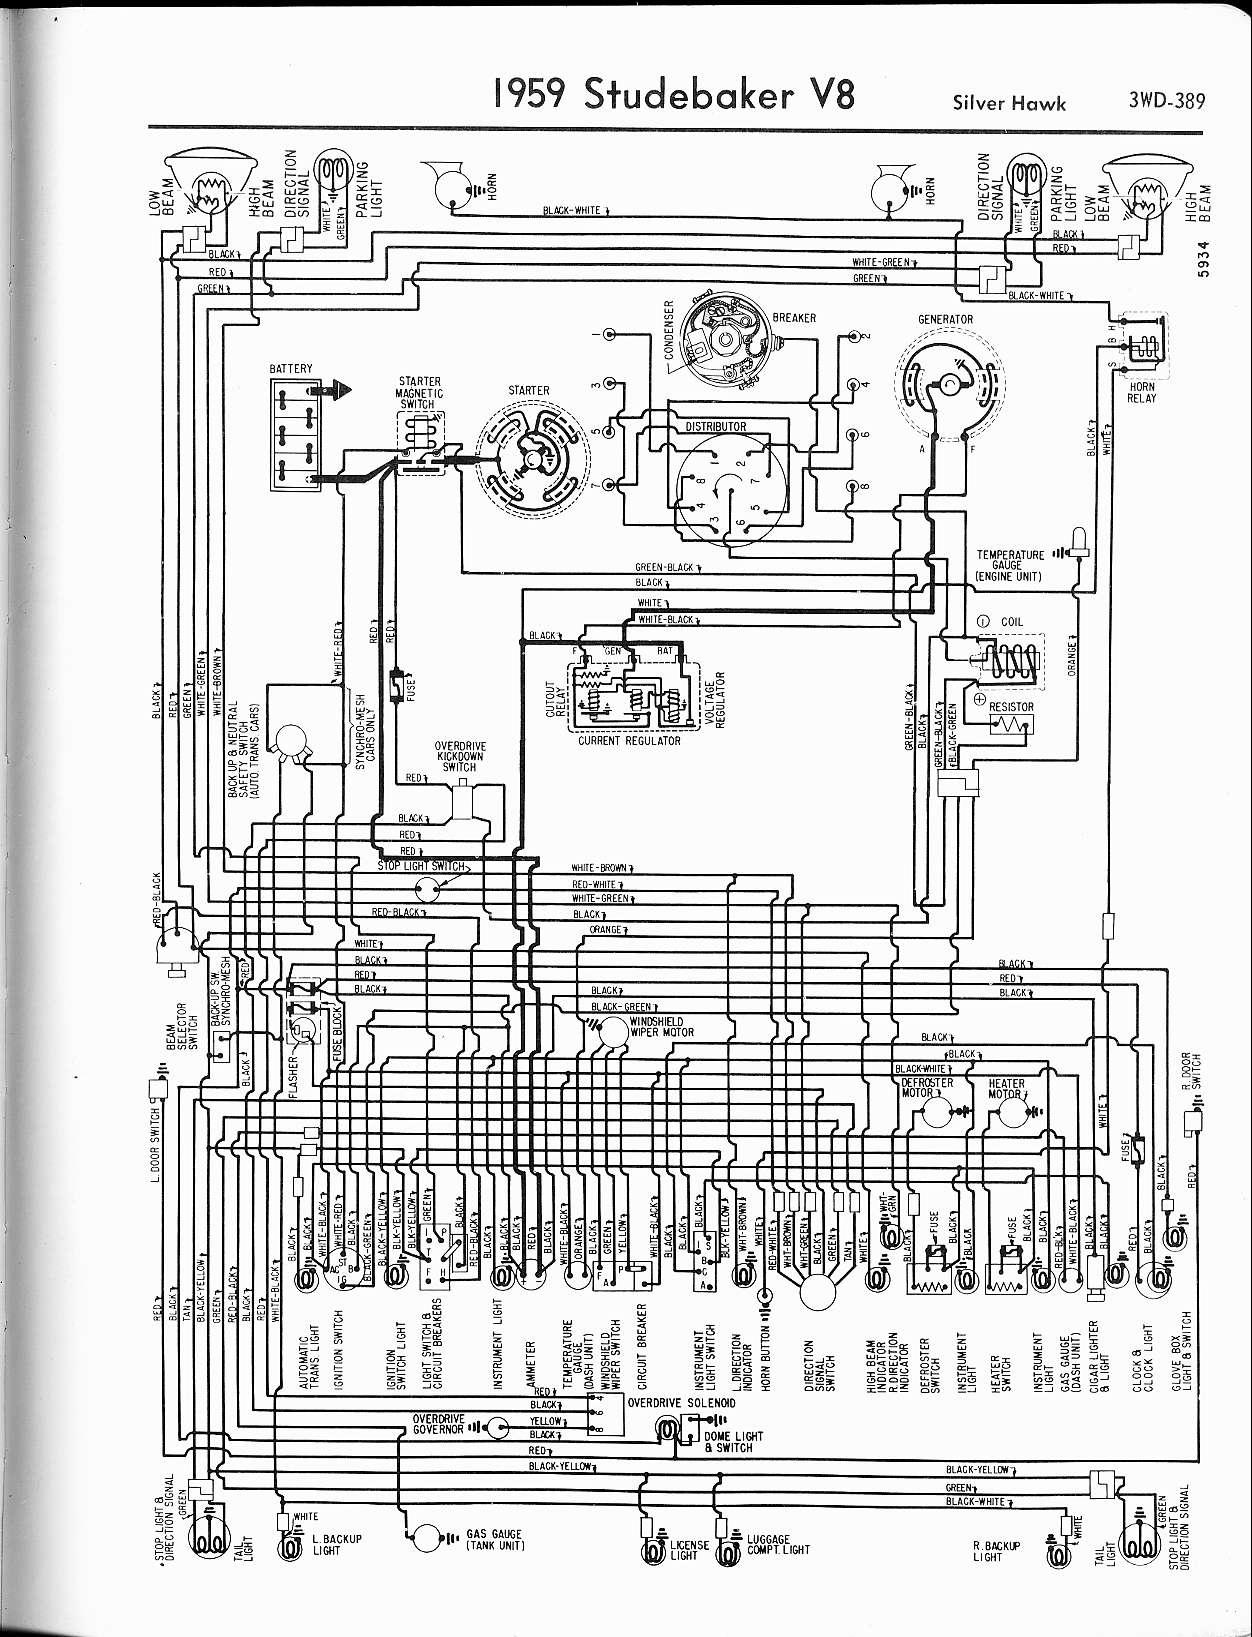 wiring diagram for 1961 studebaker 6 lark wiring diagrams source studebaker wiring diagrams the old car manual project 1951 studebaker golden hawk wiring diagram for 1961 studebaker 6 lark